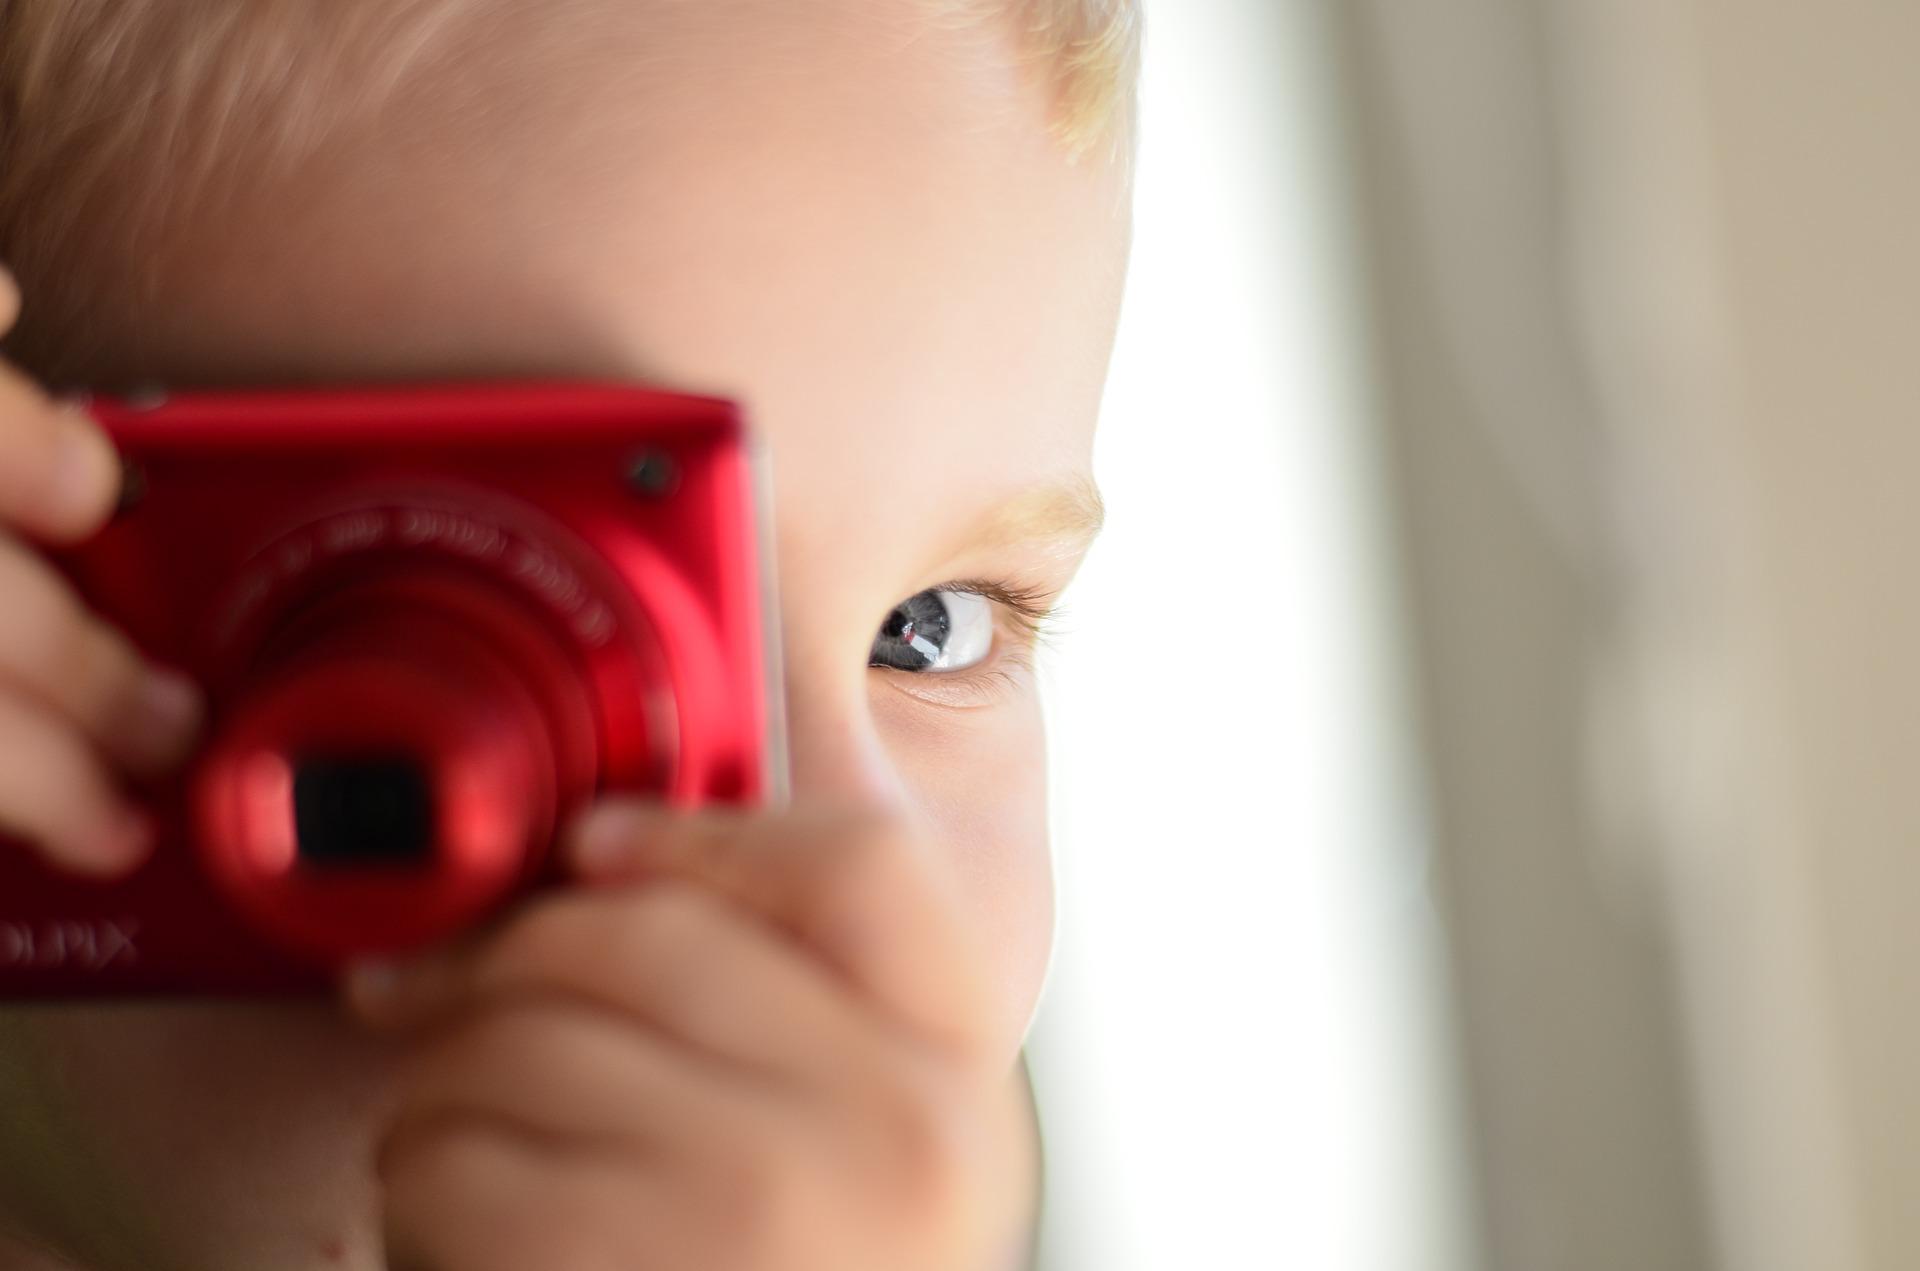 retrato primer plano niño con cámara compacta